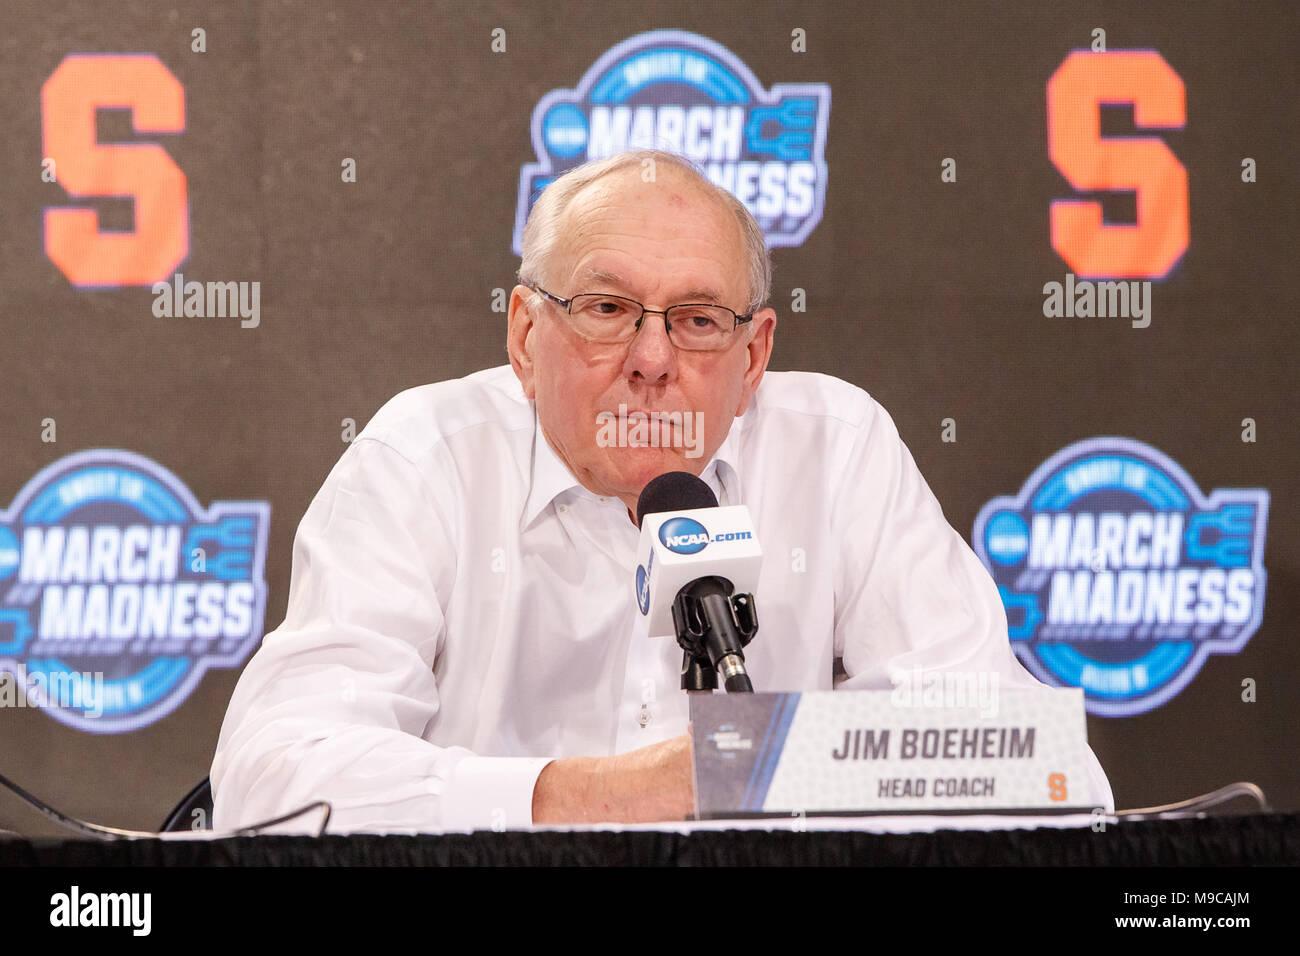 Omaha Ne U S 23rd Mar 2018 Syracuse Orange Head Coach